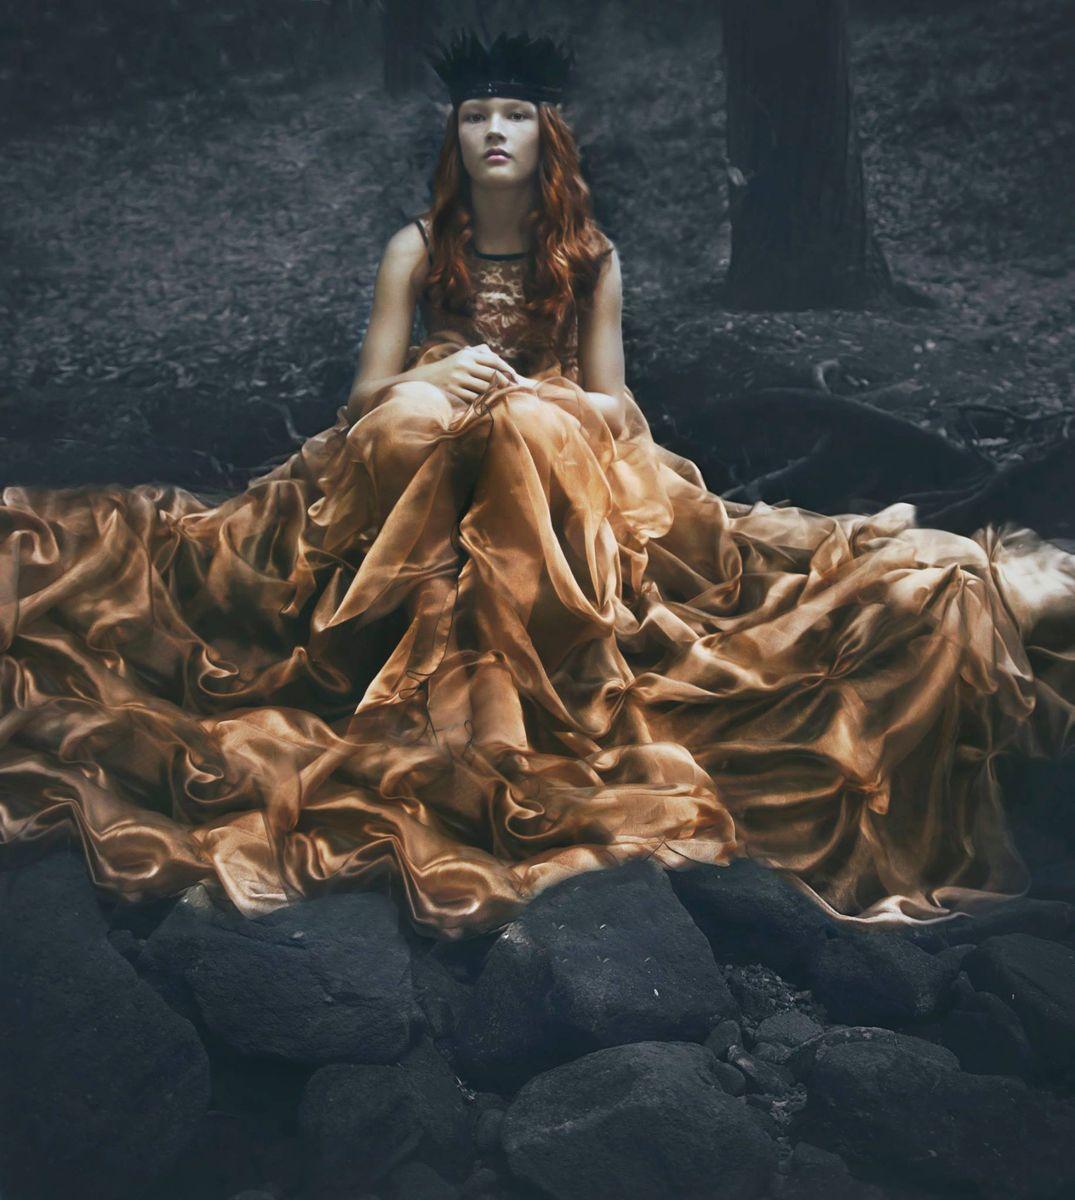 Daniela Raiti Photography (danielaraiti.photography) - Tyla - hmua Danielle Murrihy - dsg Tarese Klemens